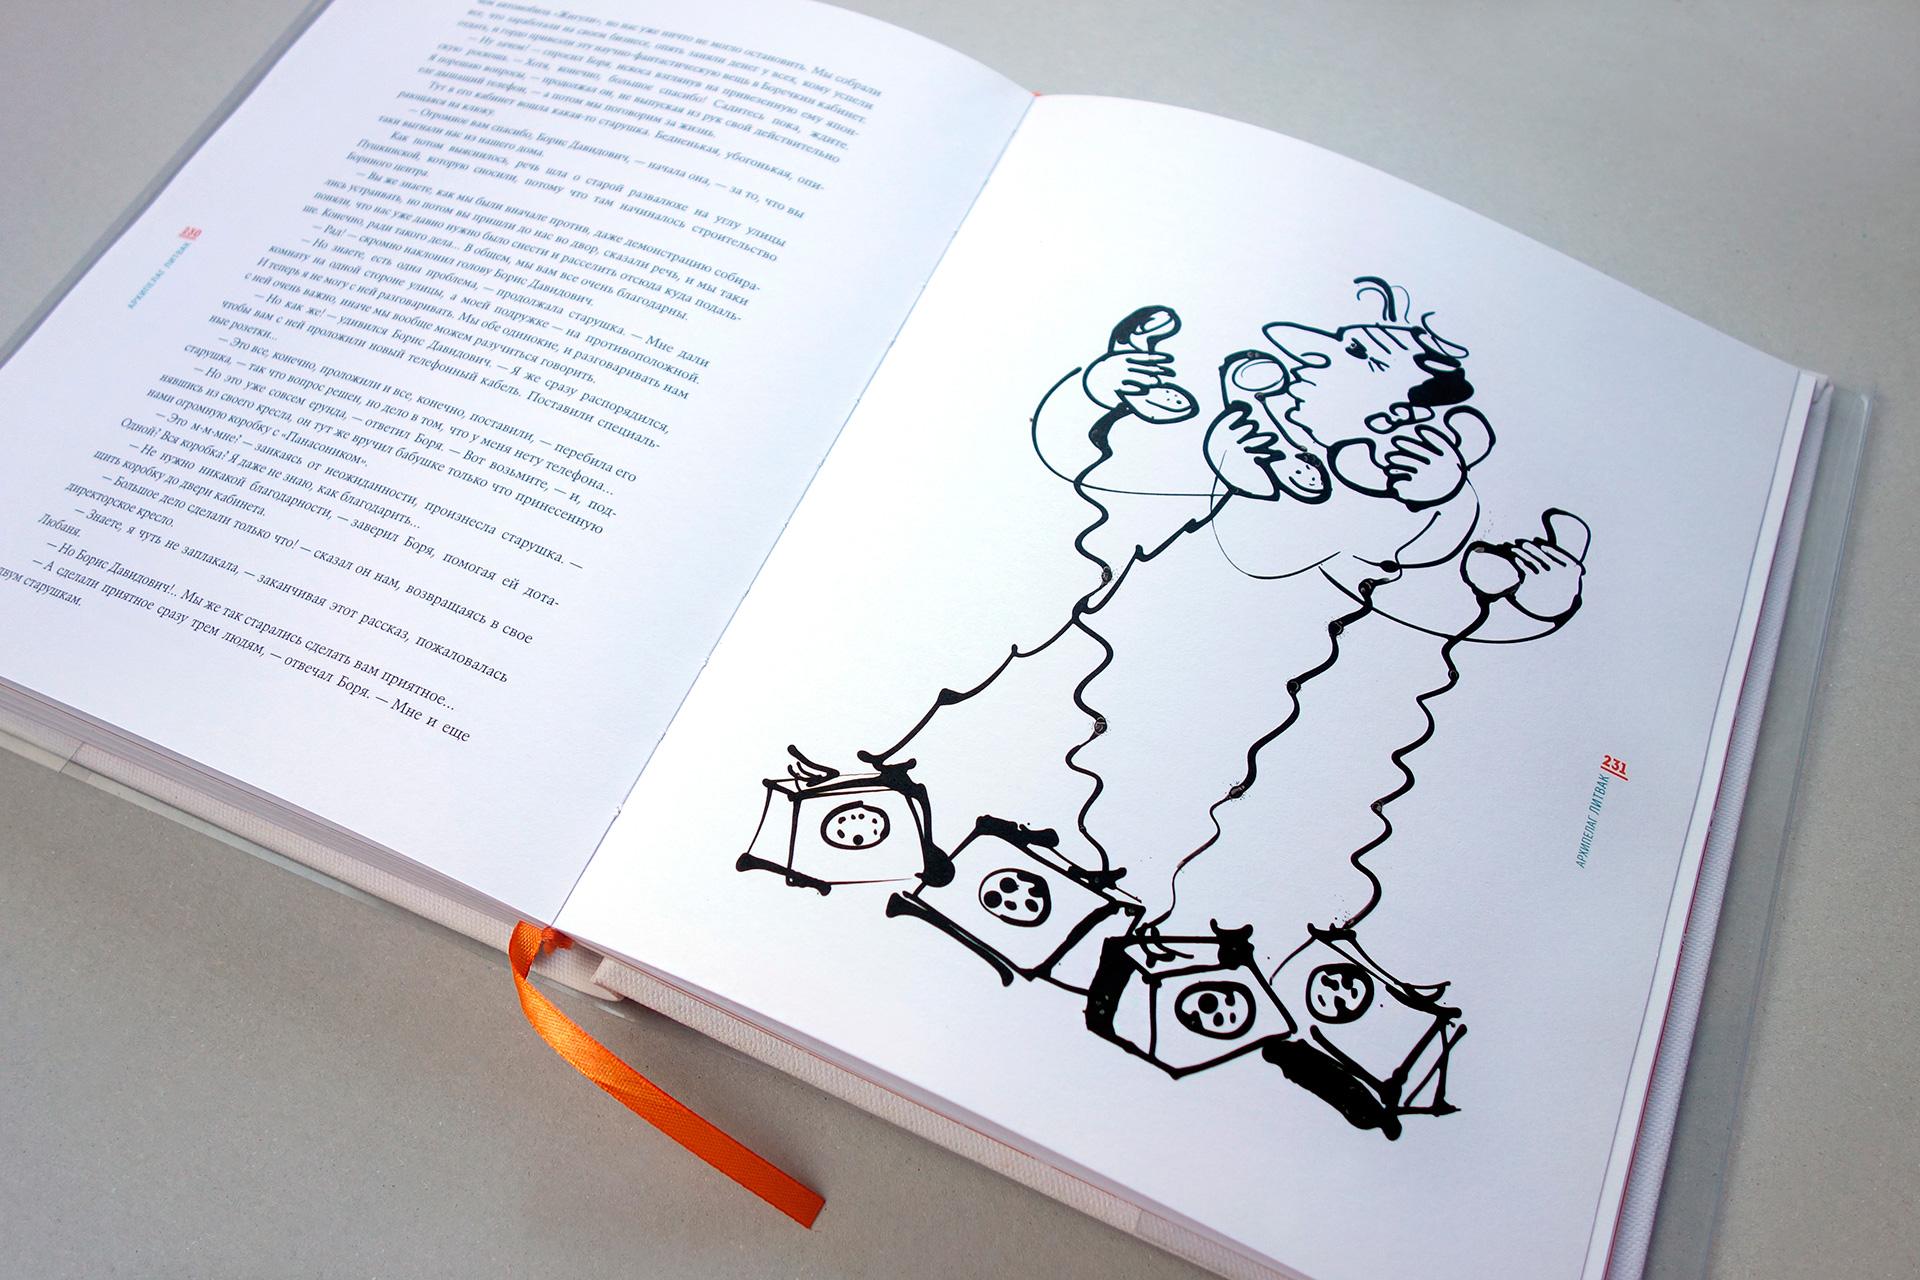 Asgard Branding, anniversary album, design, print, printed publications, book design, George Golubenko